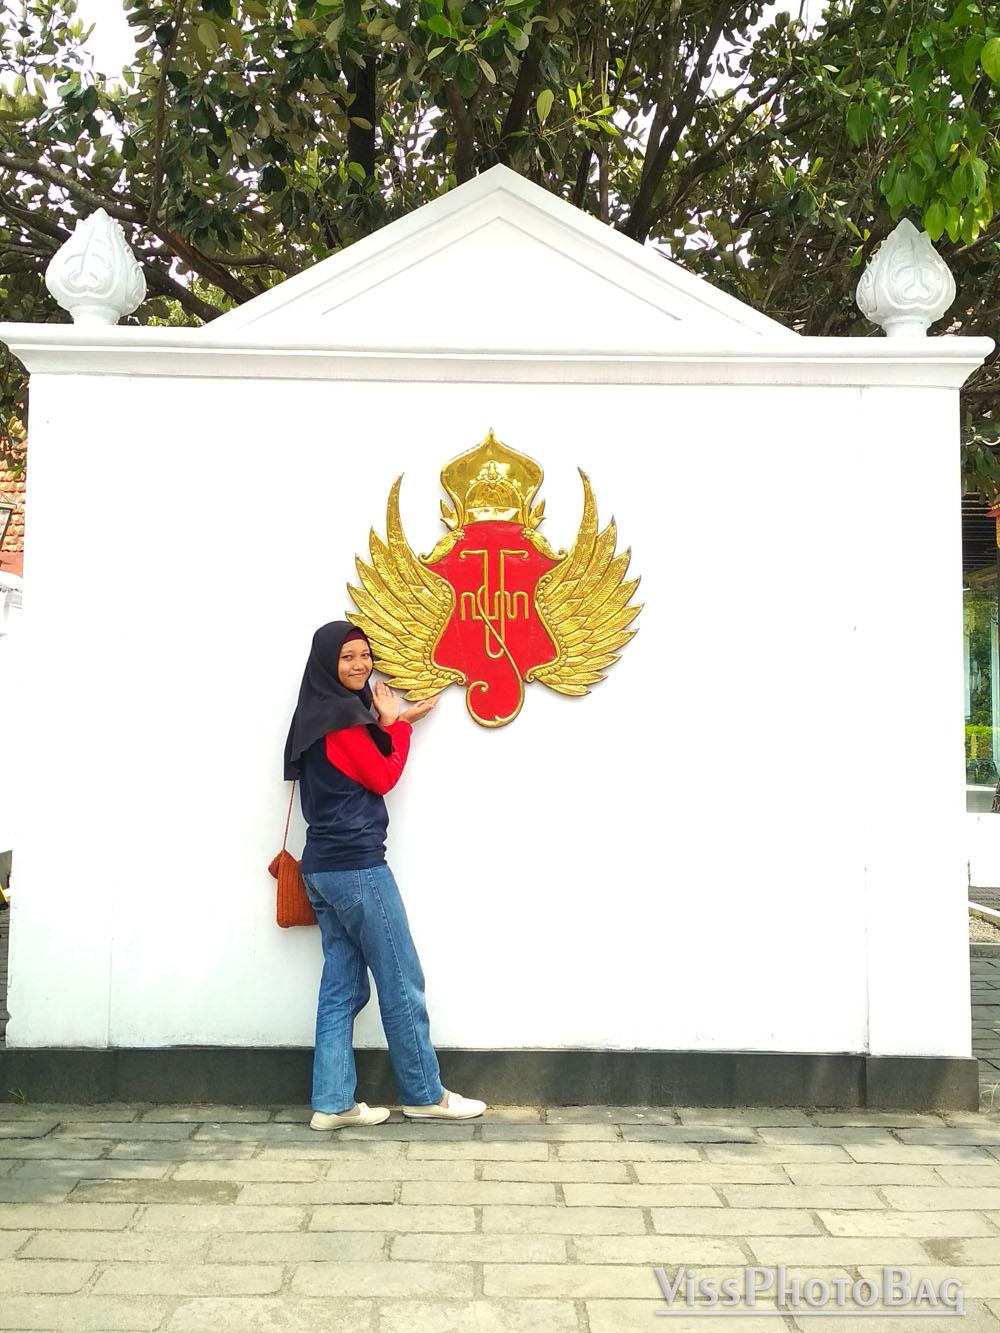 Wisata Murah Kaya Budaya Keraton Yogyakarta Sejarah Tengah Kota Story